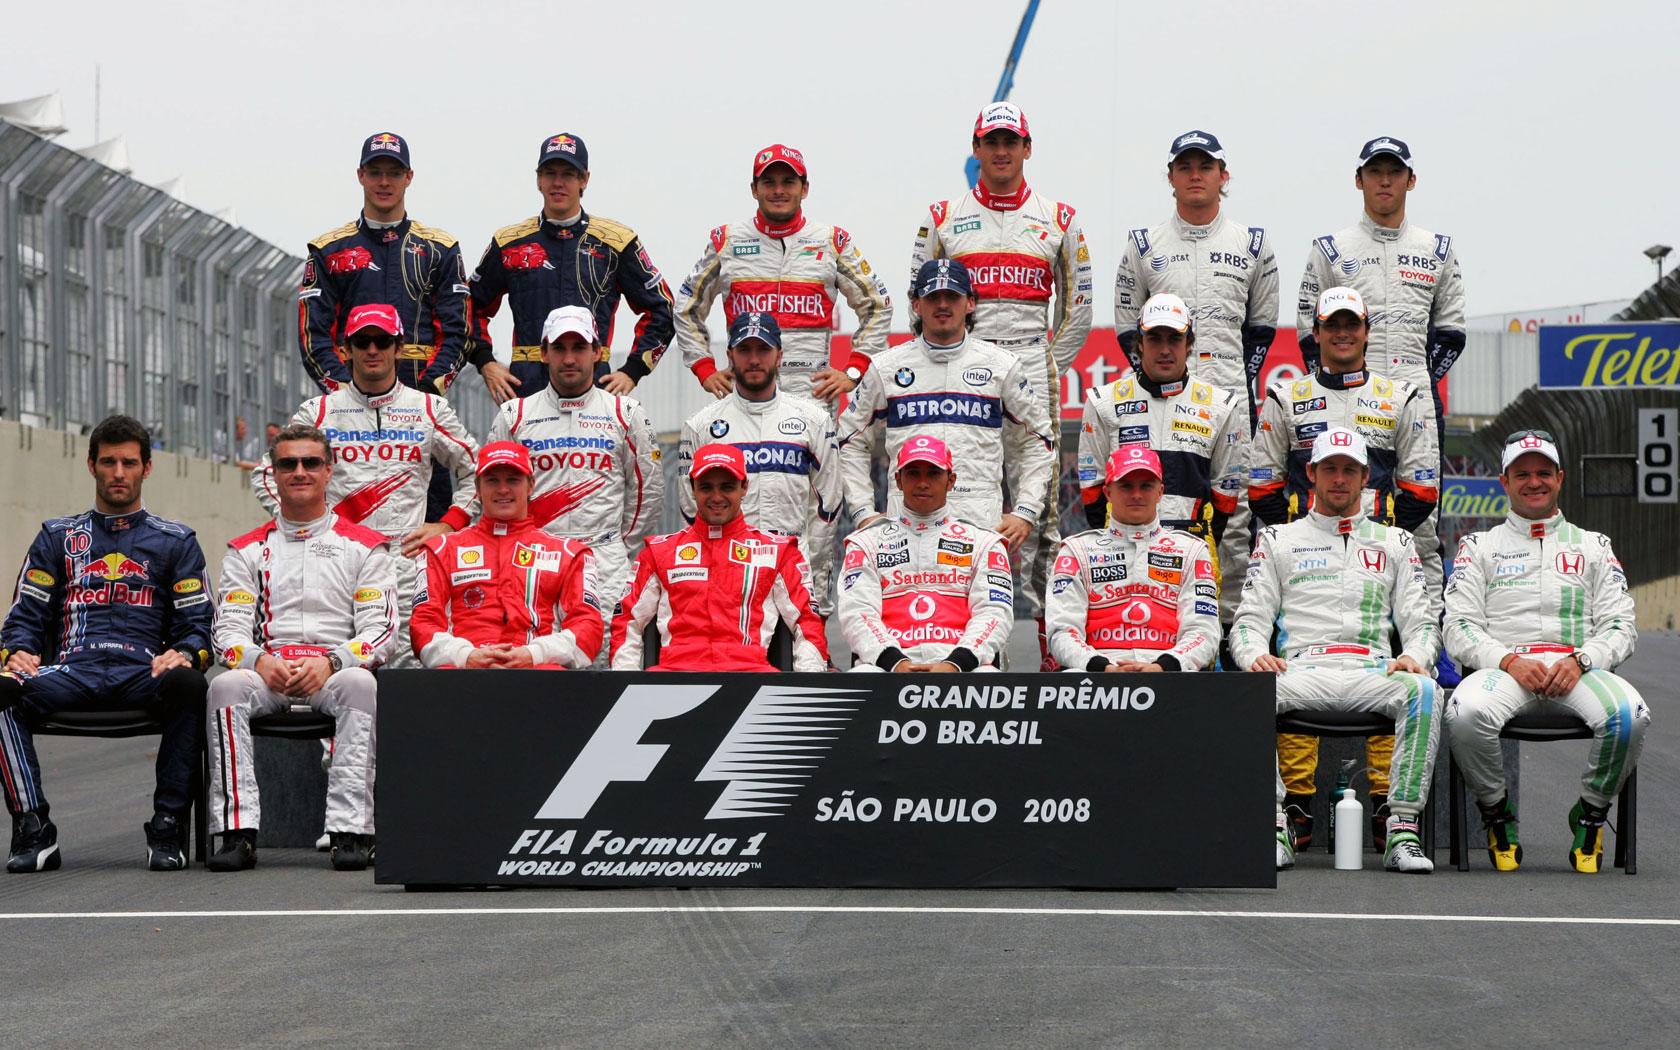 HD Wallpapers 2008 Formula 1 Grand Prix of Brazil | F1 ...